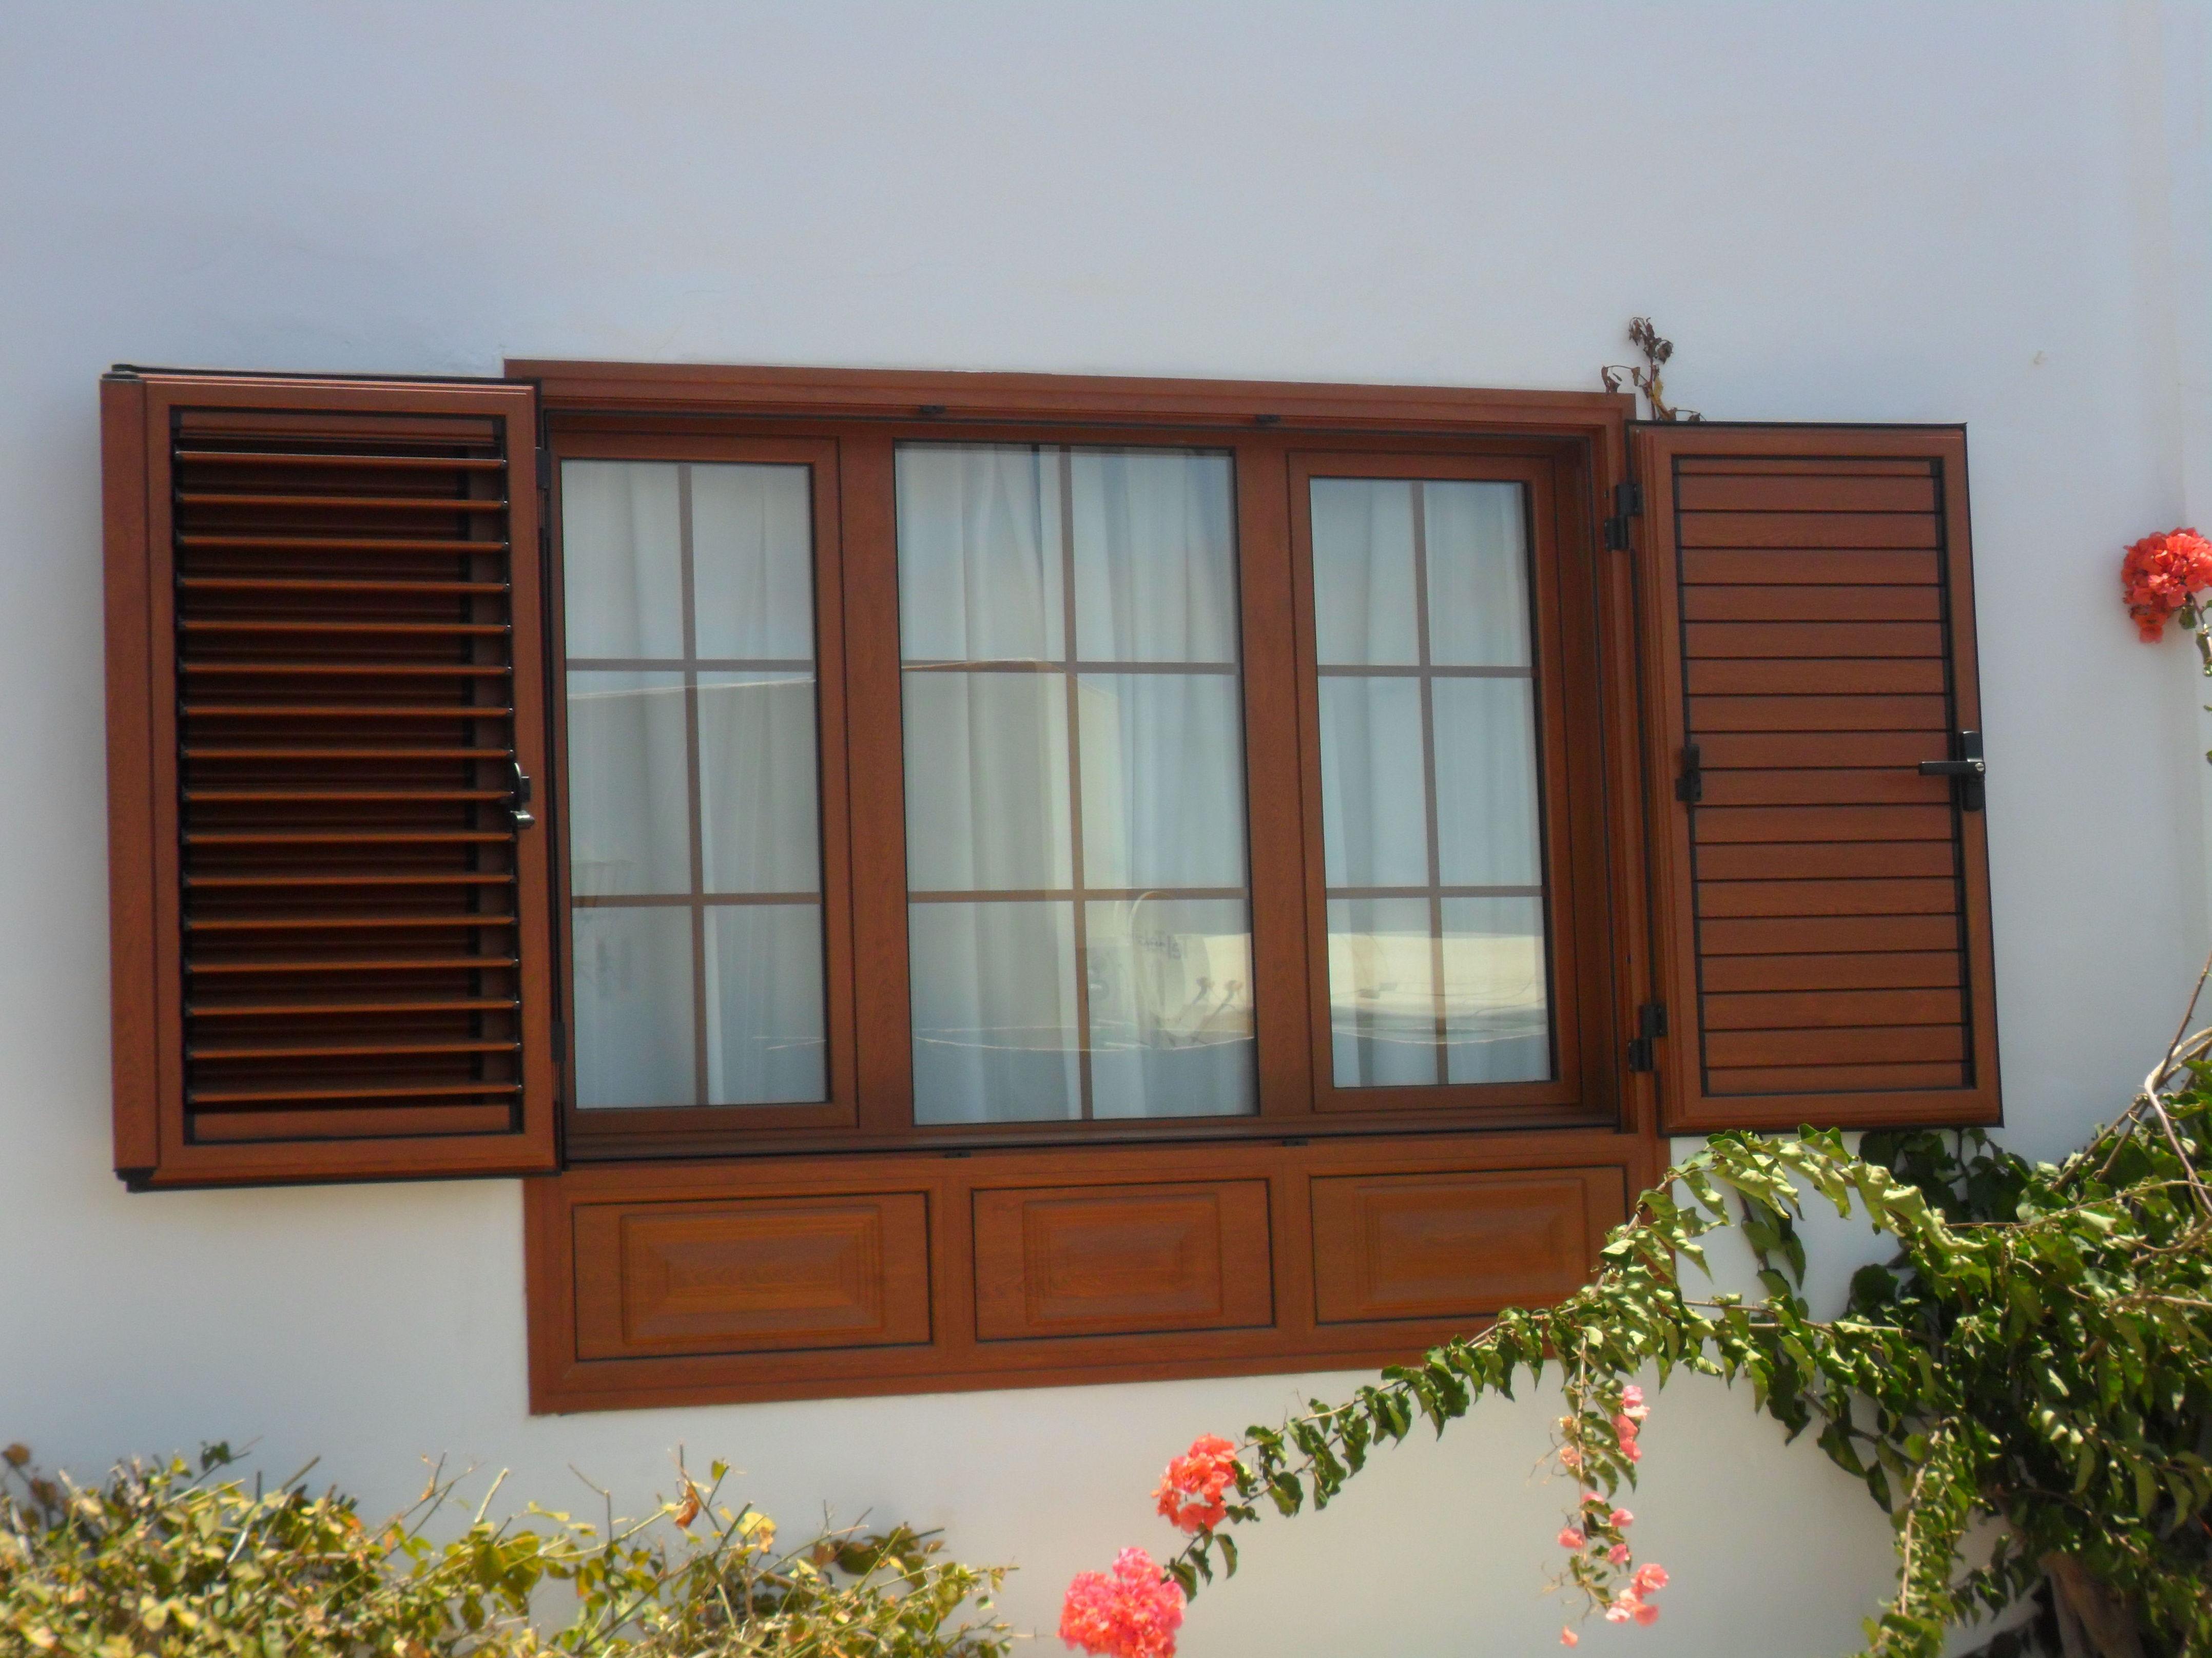 Foto 14 de carpinter a de aluminio en indusphal s l for Ventanales de aluminio imitacion madera